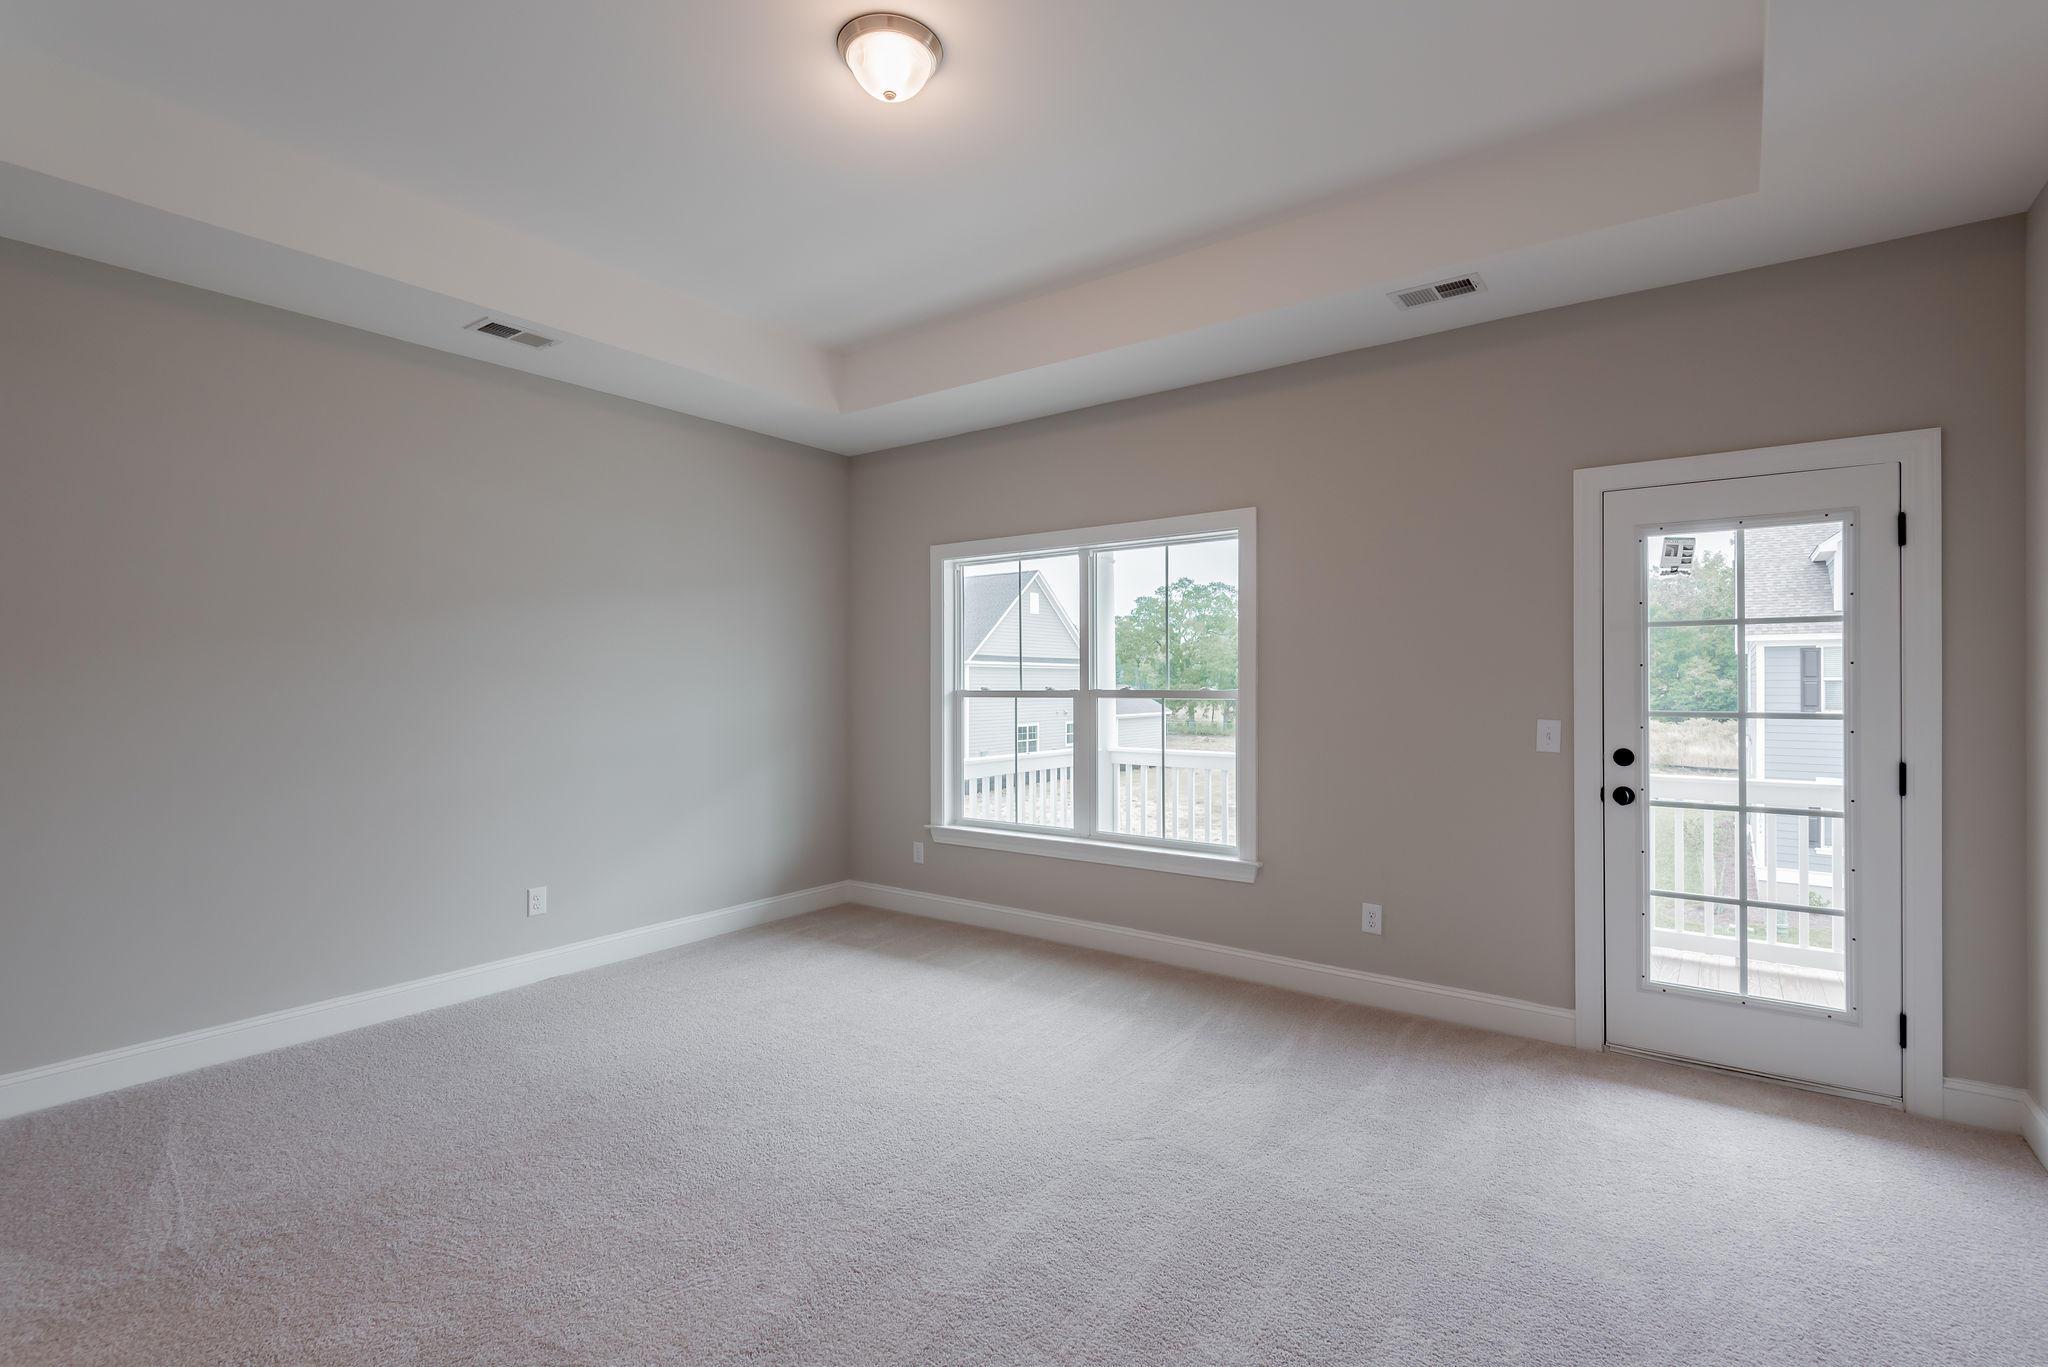 Oak Bluff Homes For Sale - 9 Oak Bluff, Charleston, SC - 7